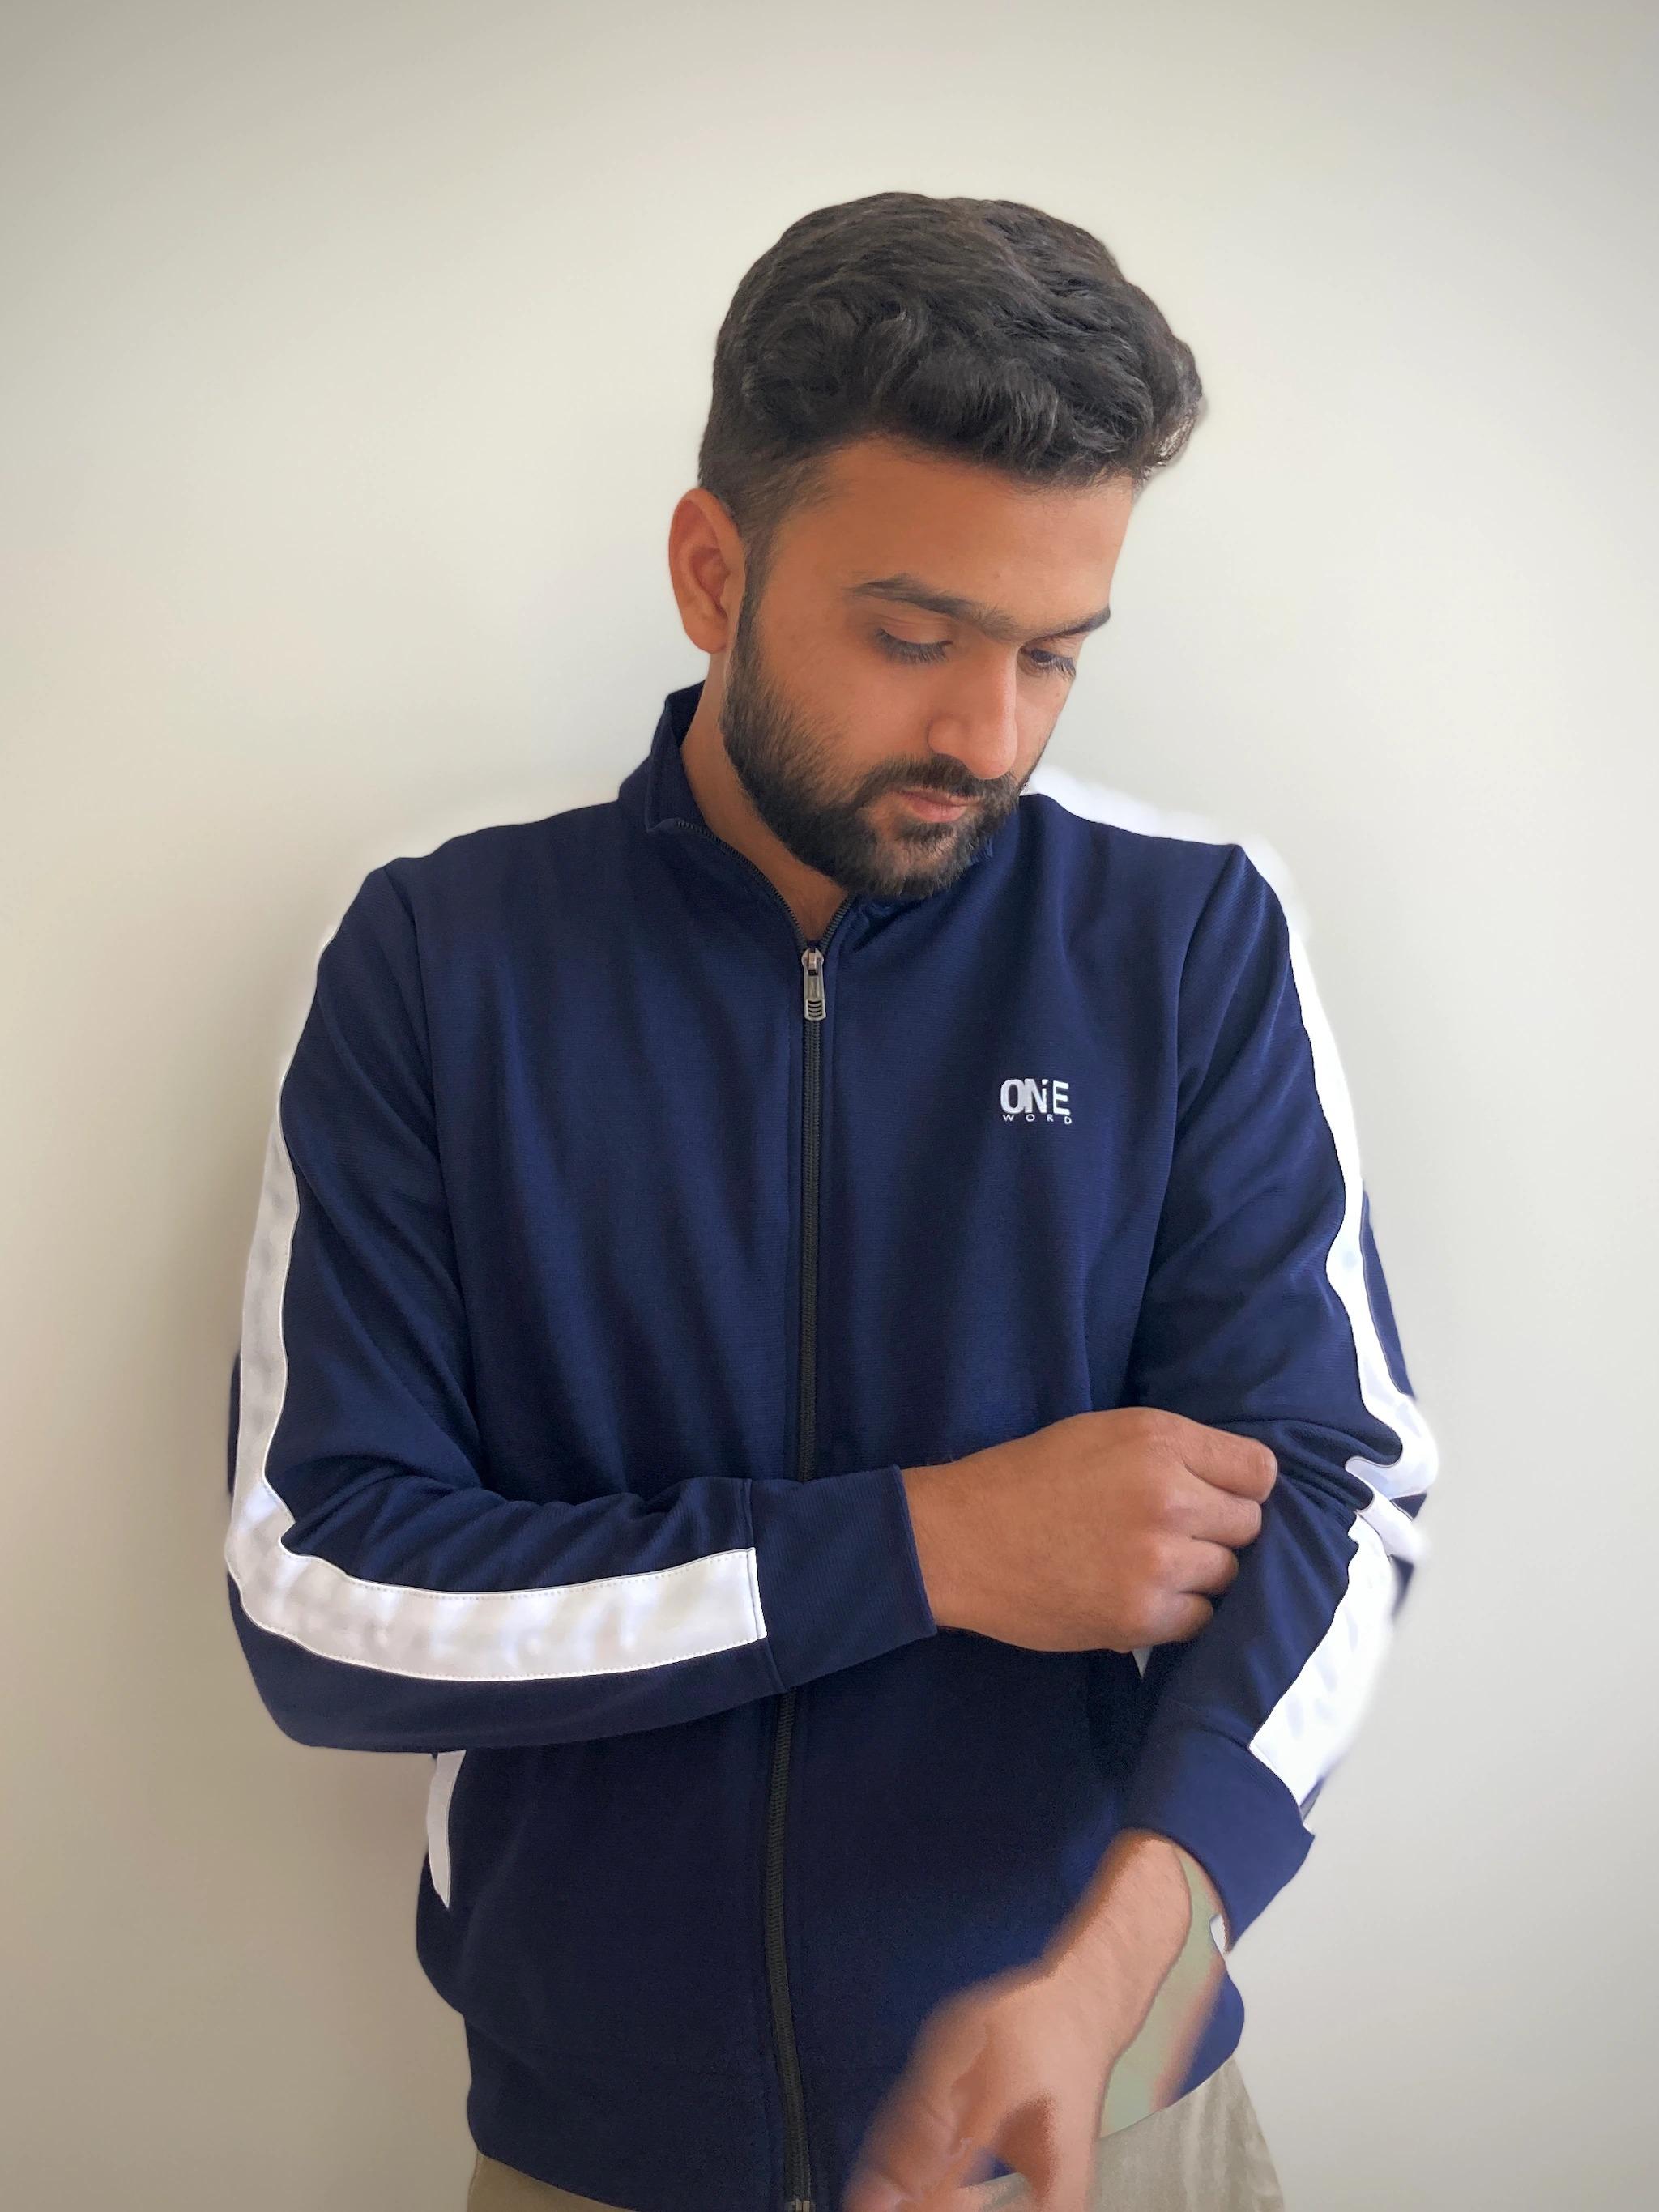 One Word Navy Blue Track Jacket (XL)